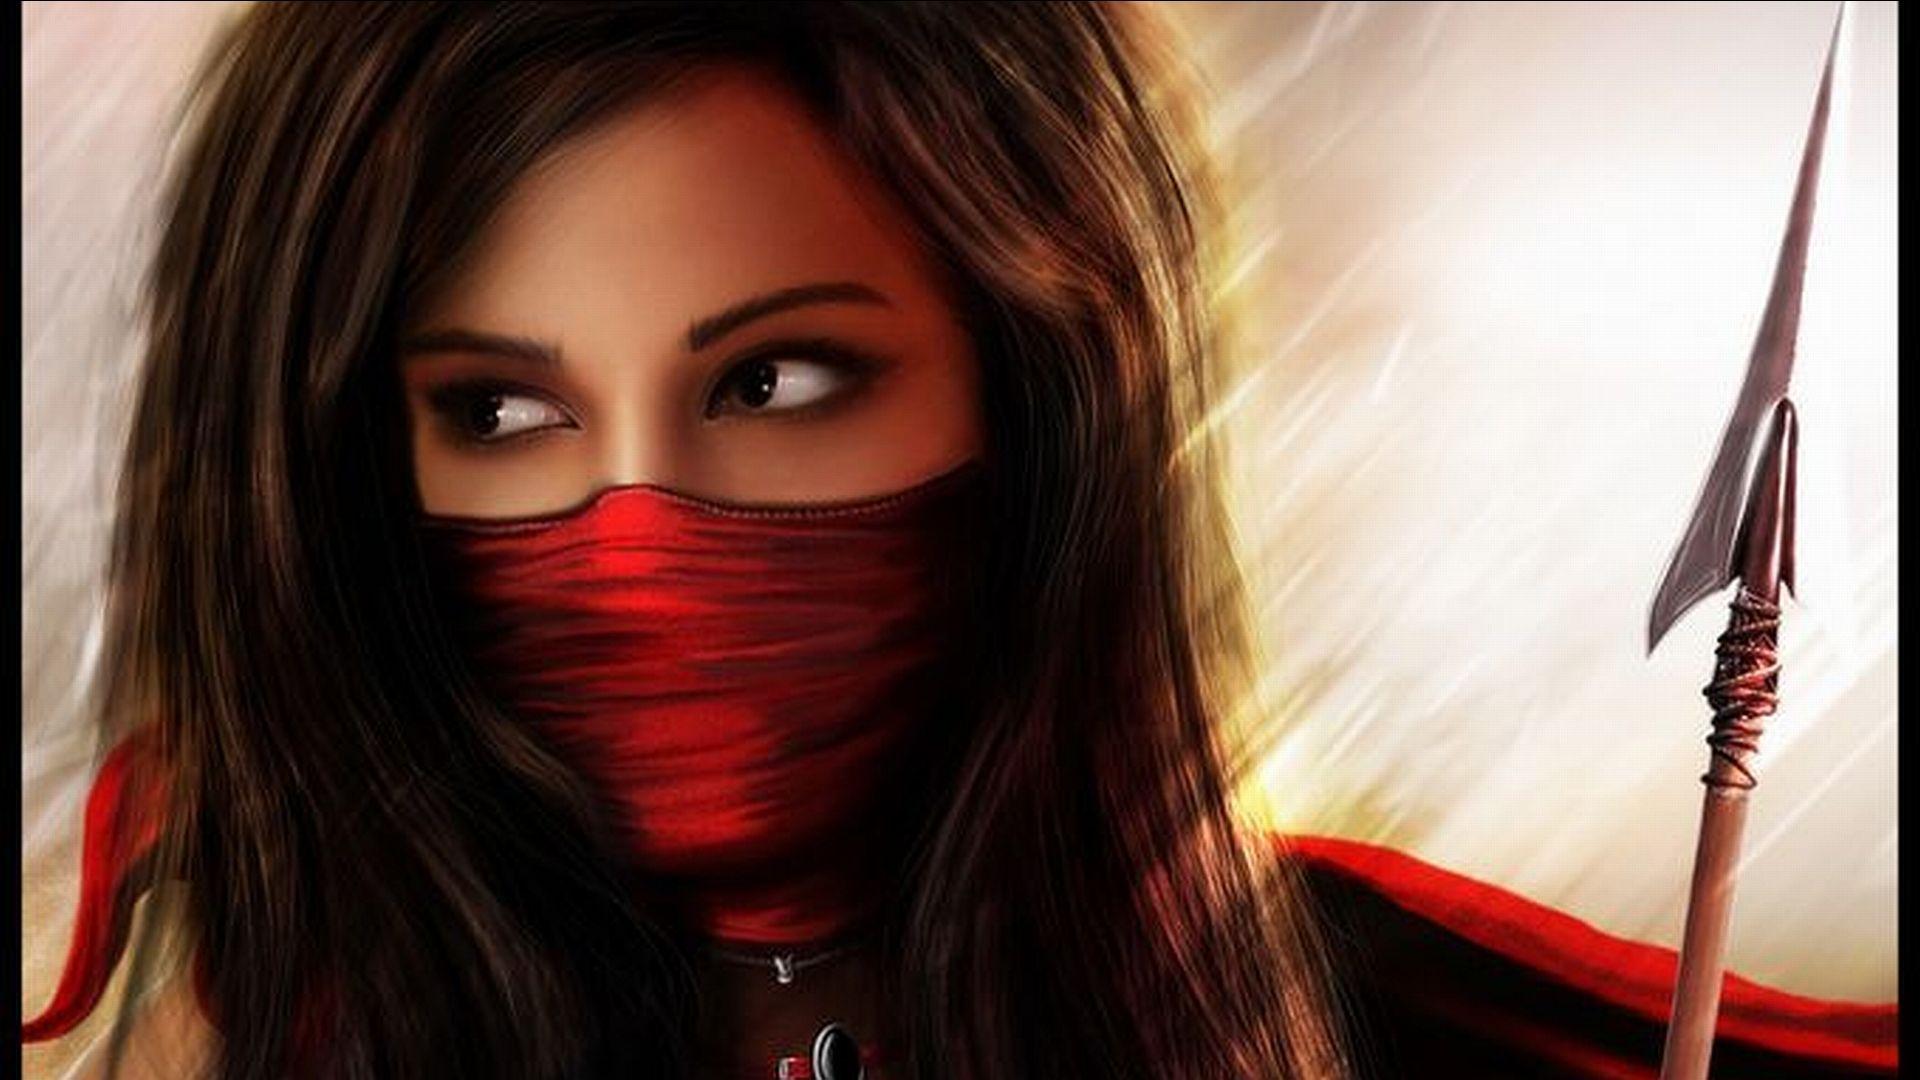 Women Warrior Full HD Wallpaper and Background | 1920x1080 | ID:506346